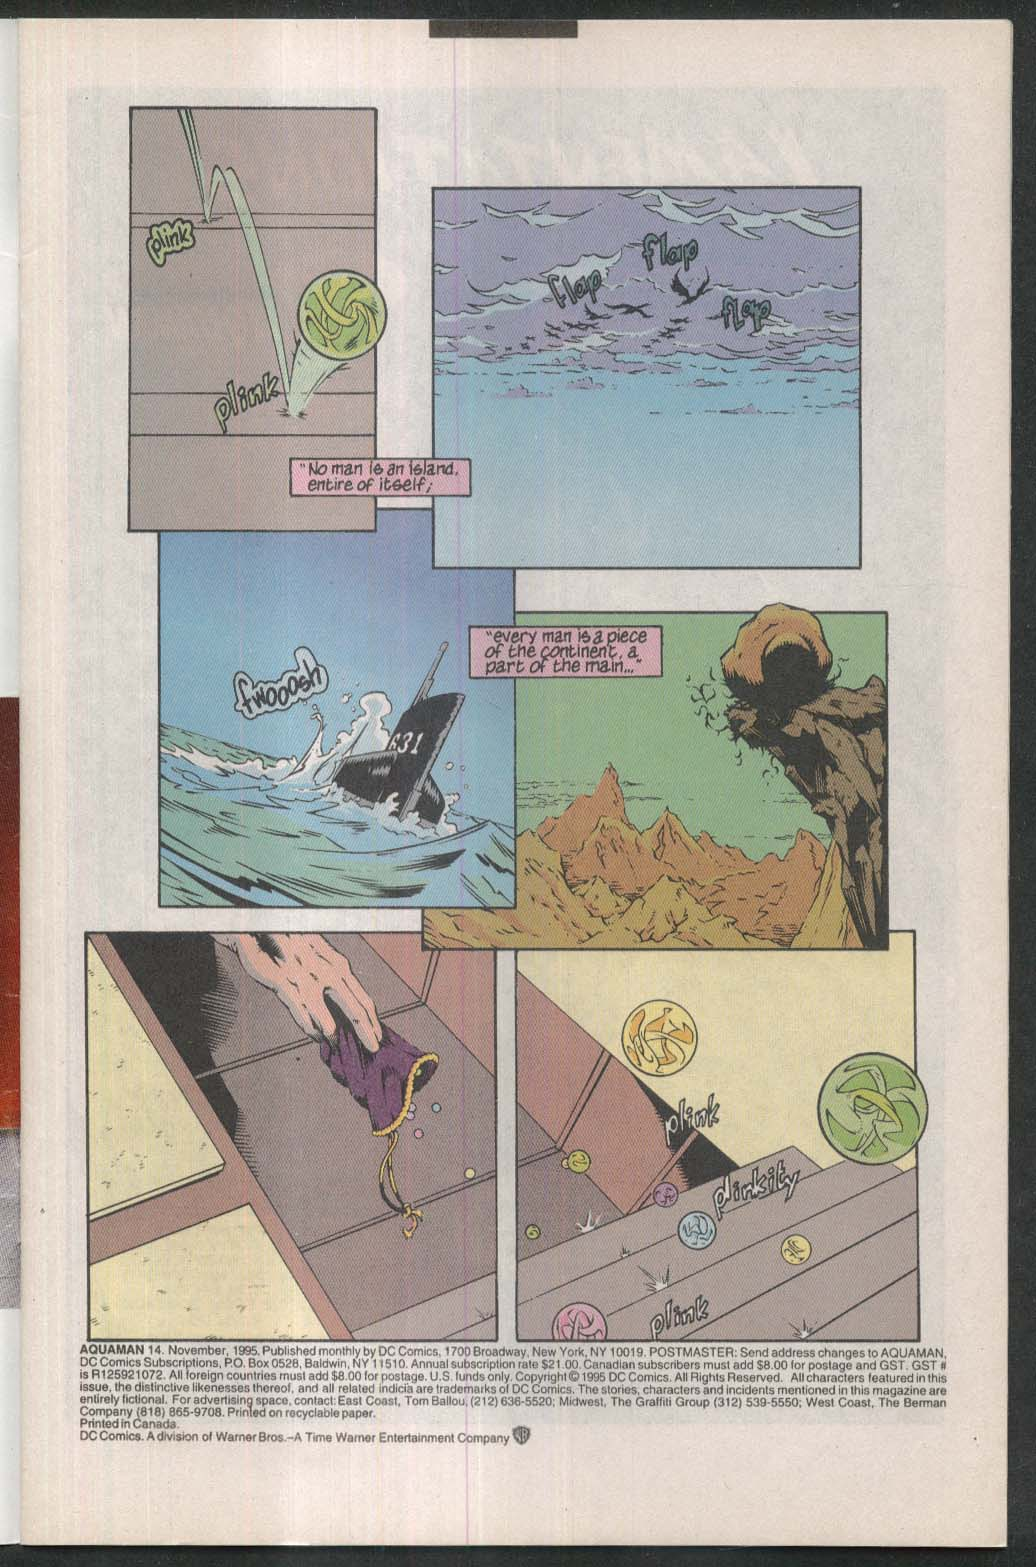 AQUAMAN #14 DC comic book 11 1995